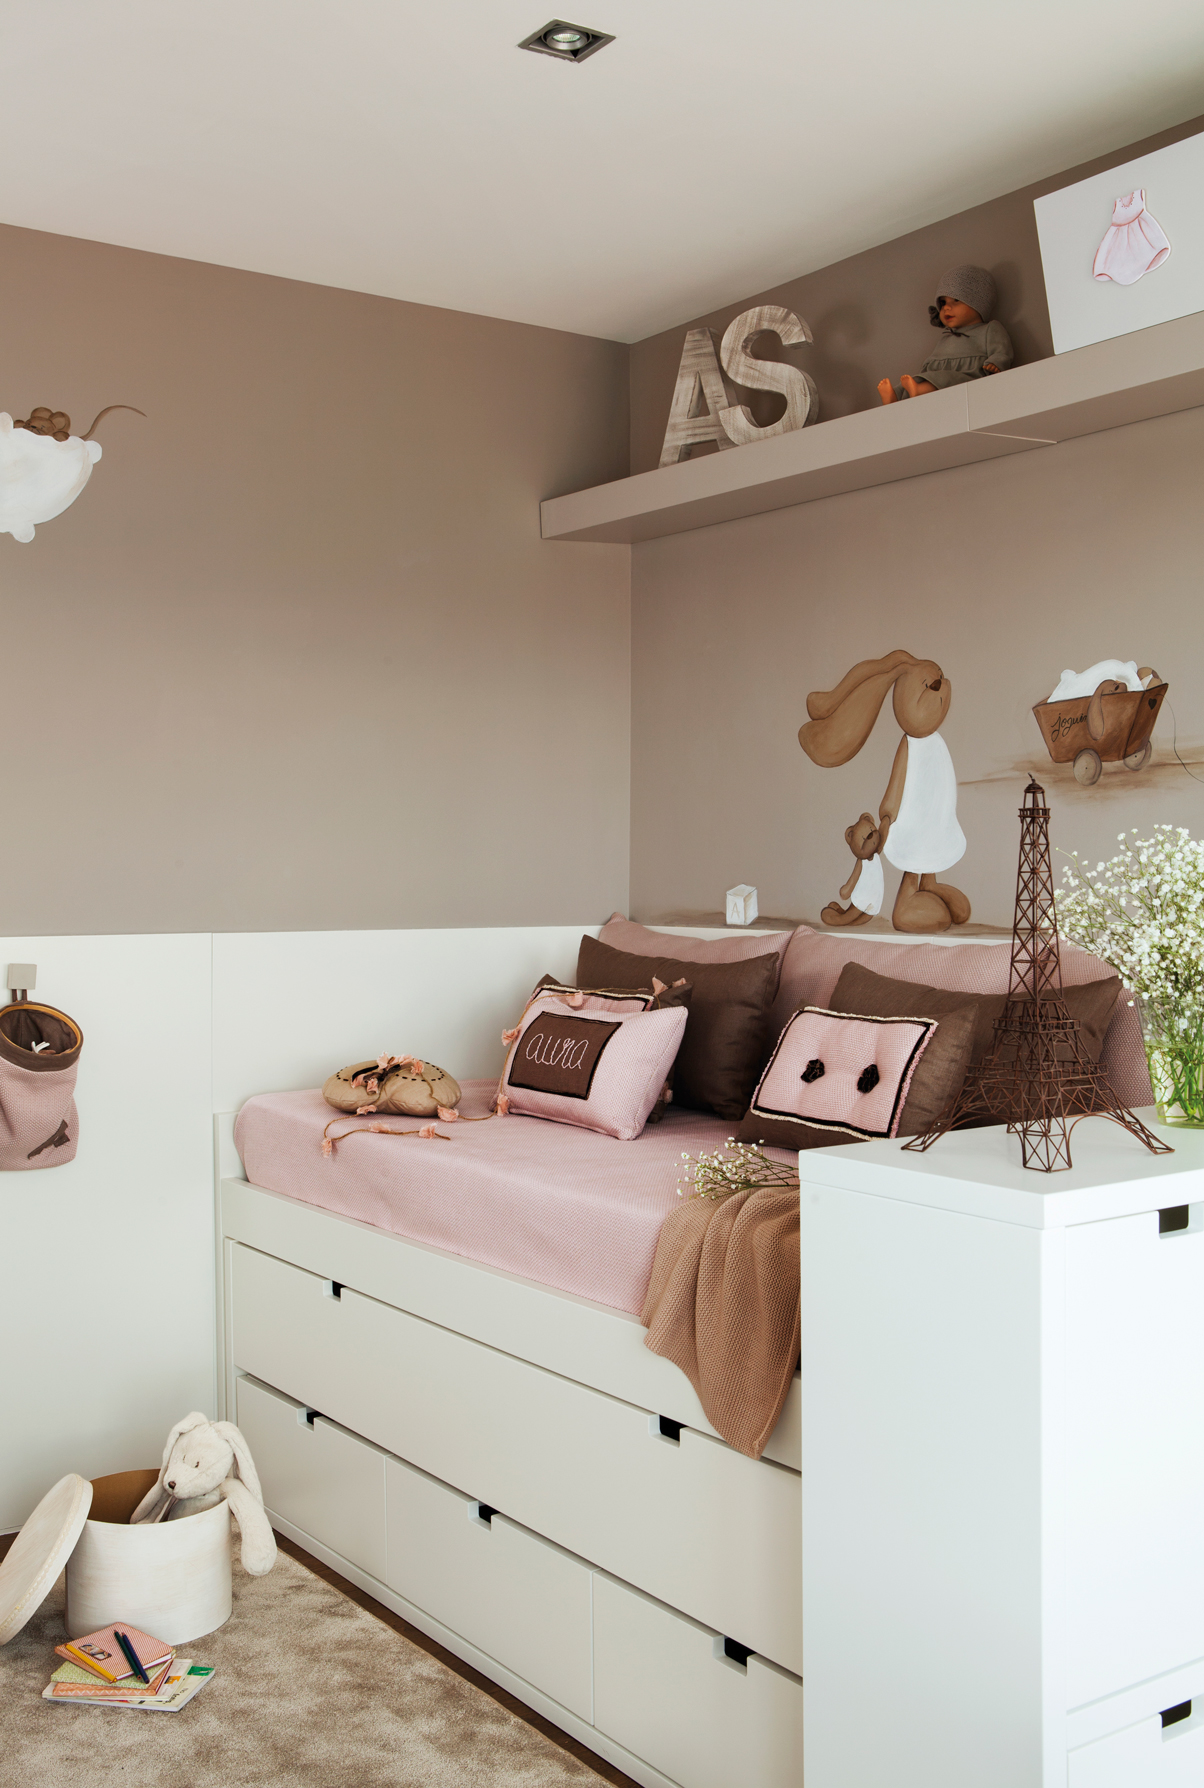 Pintar dormitorio infantil - Habitacion infantil cama nido ...